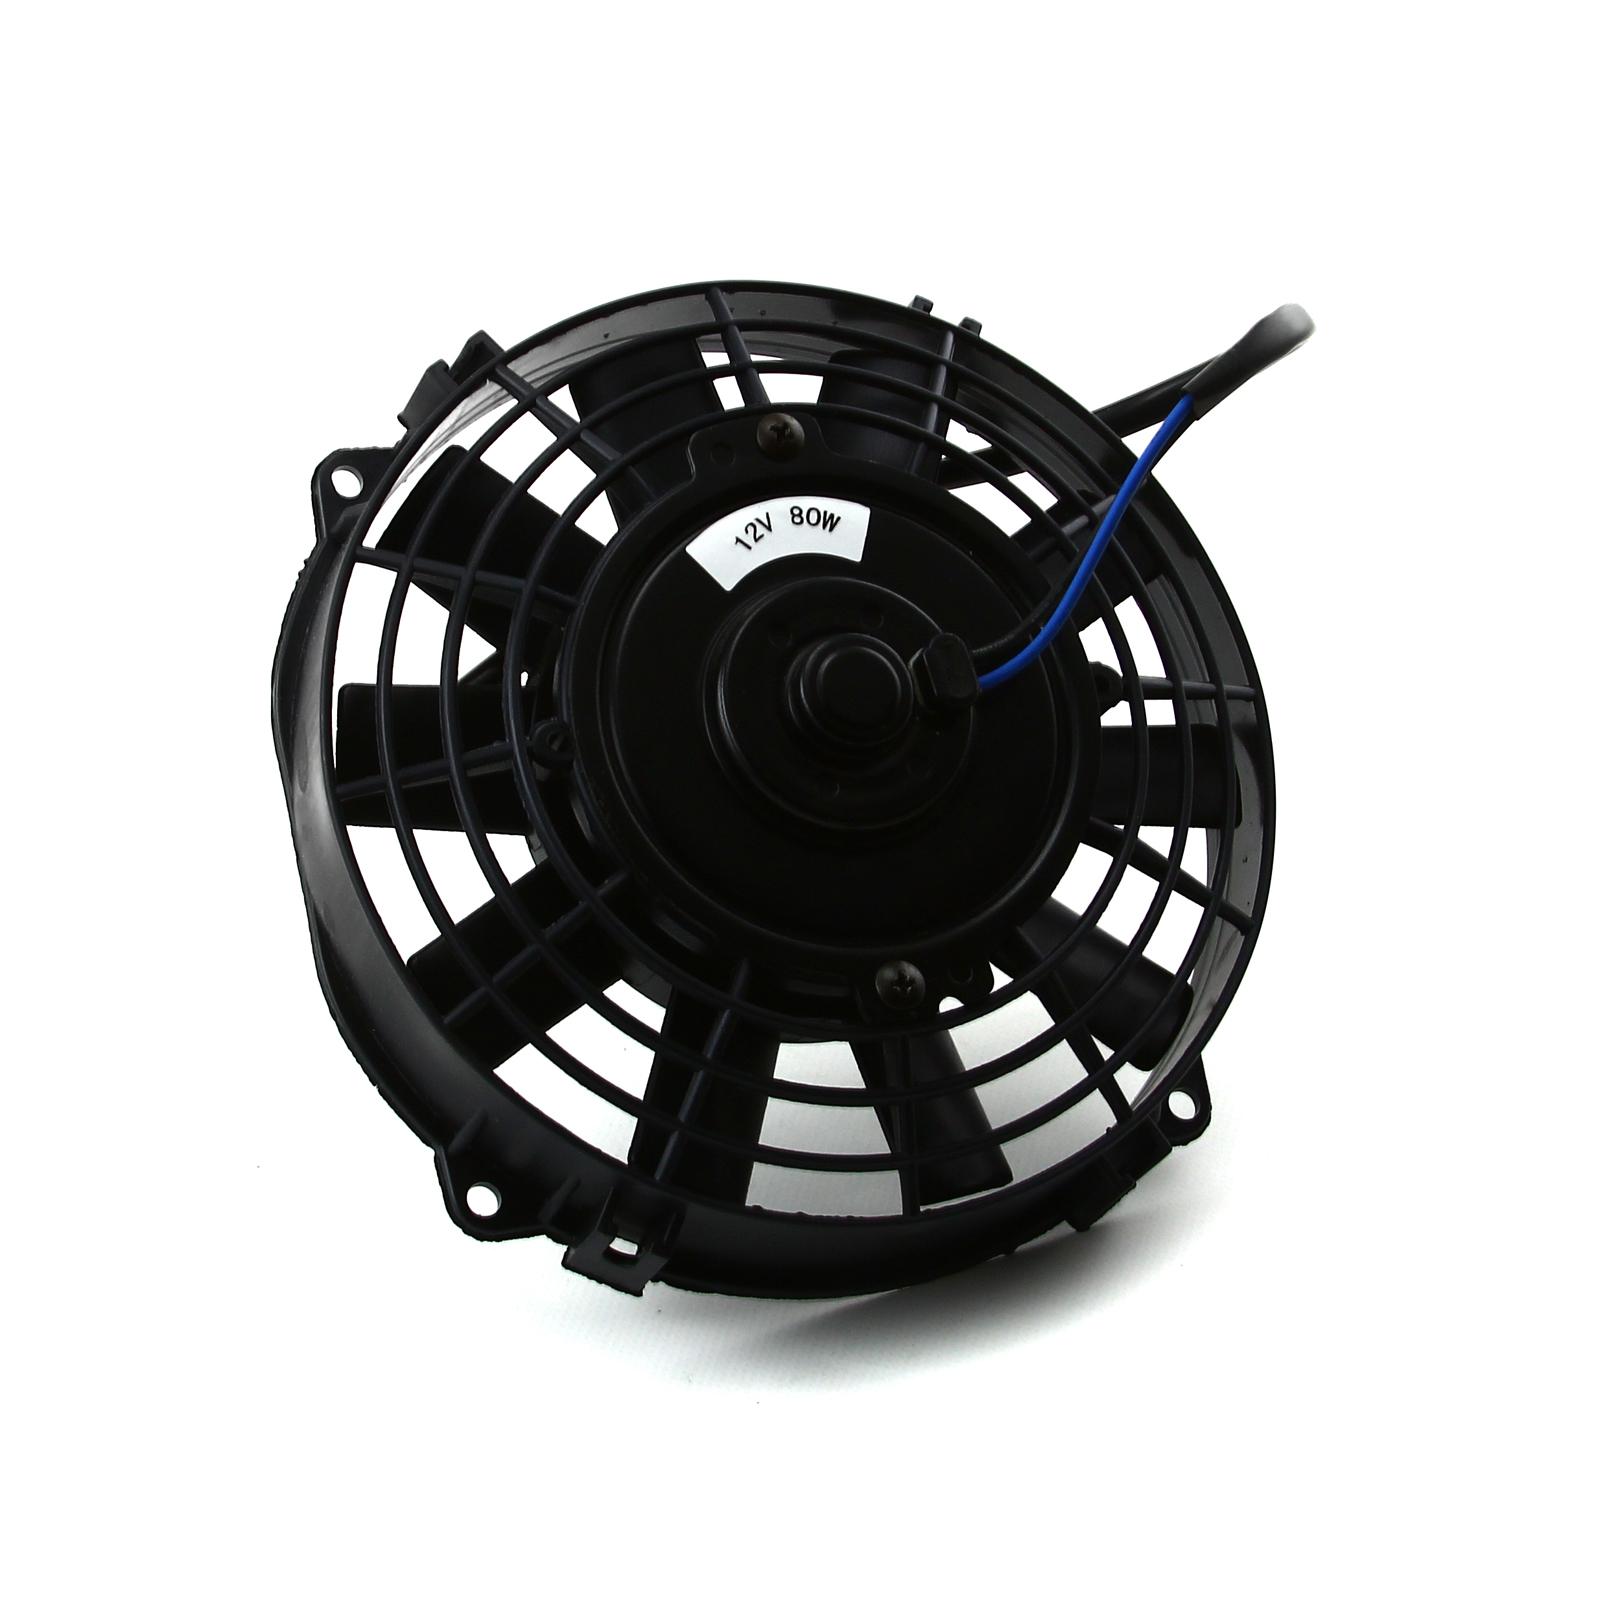 12v Blower Fan 500 Cfm : Quot reversable v radiator electric thermo fan ebay